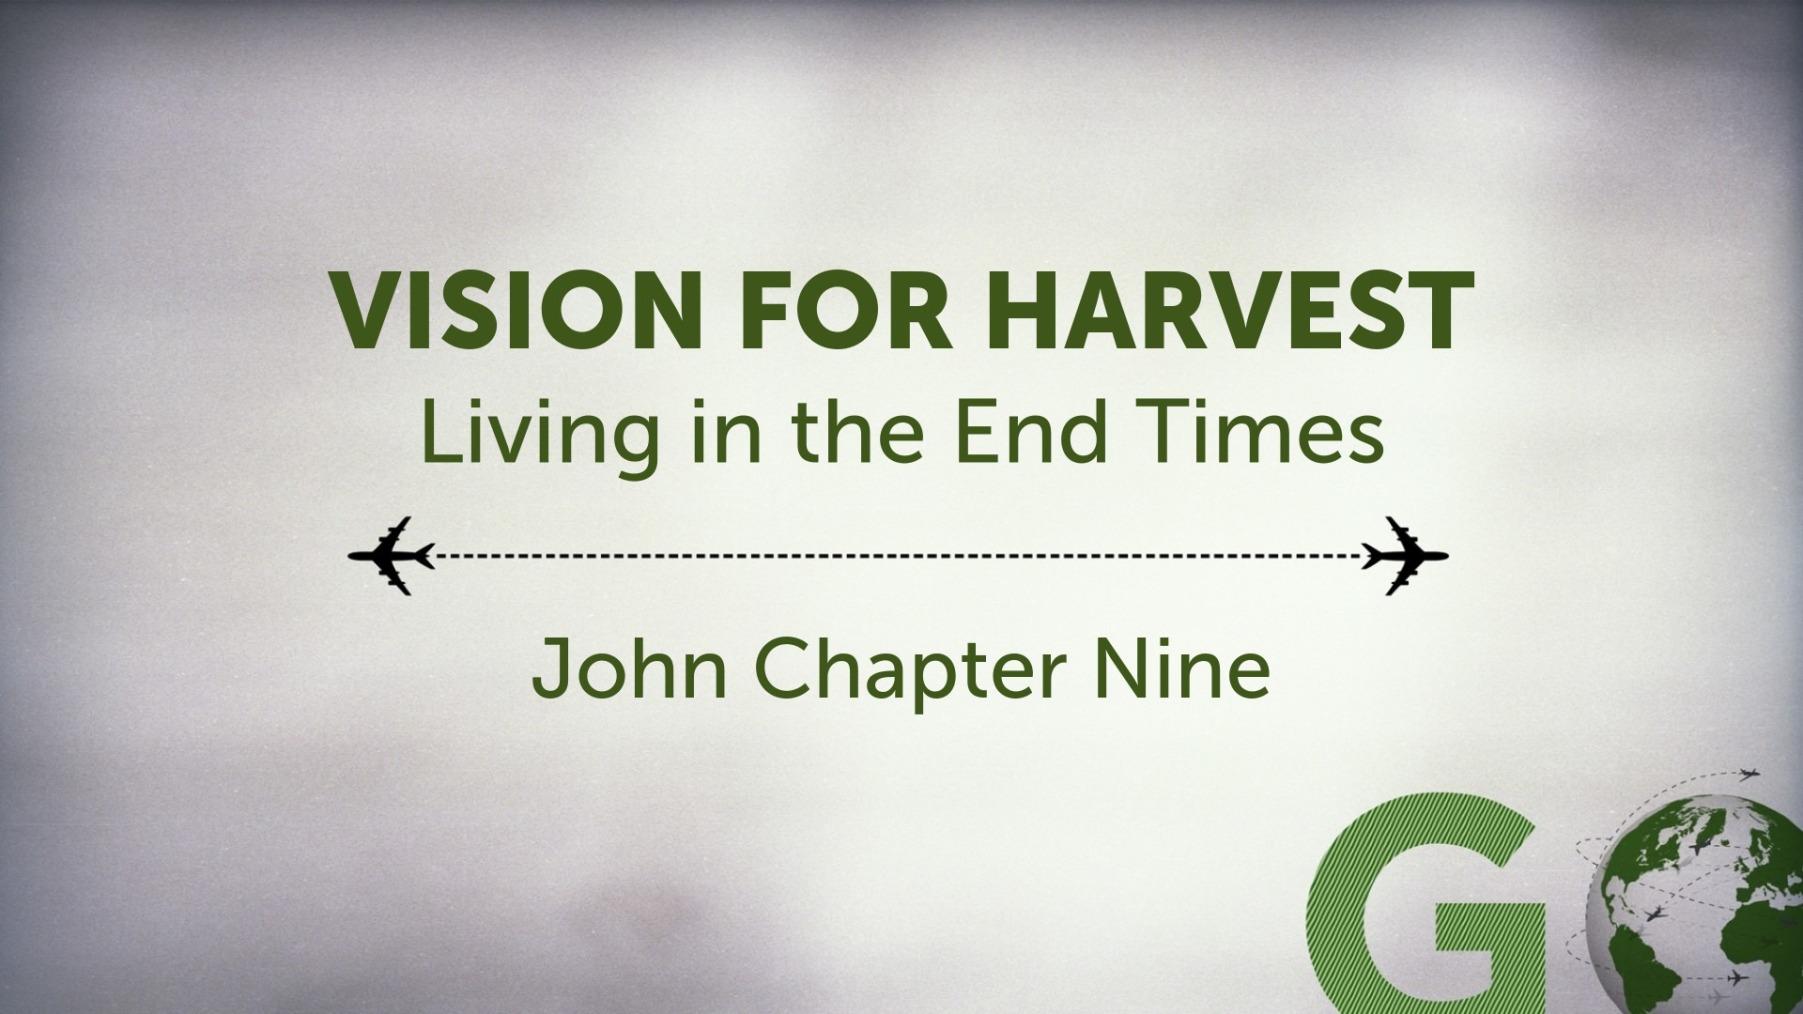 Vision for Harvest